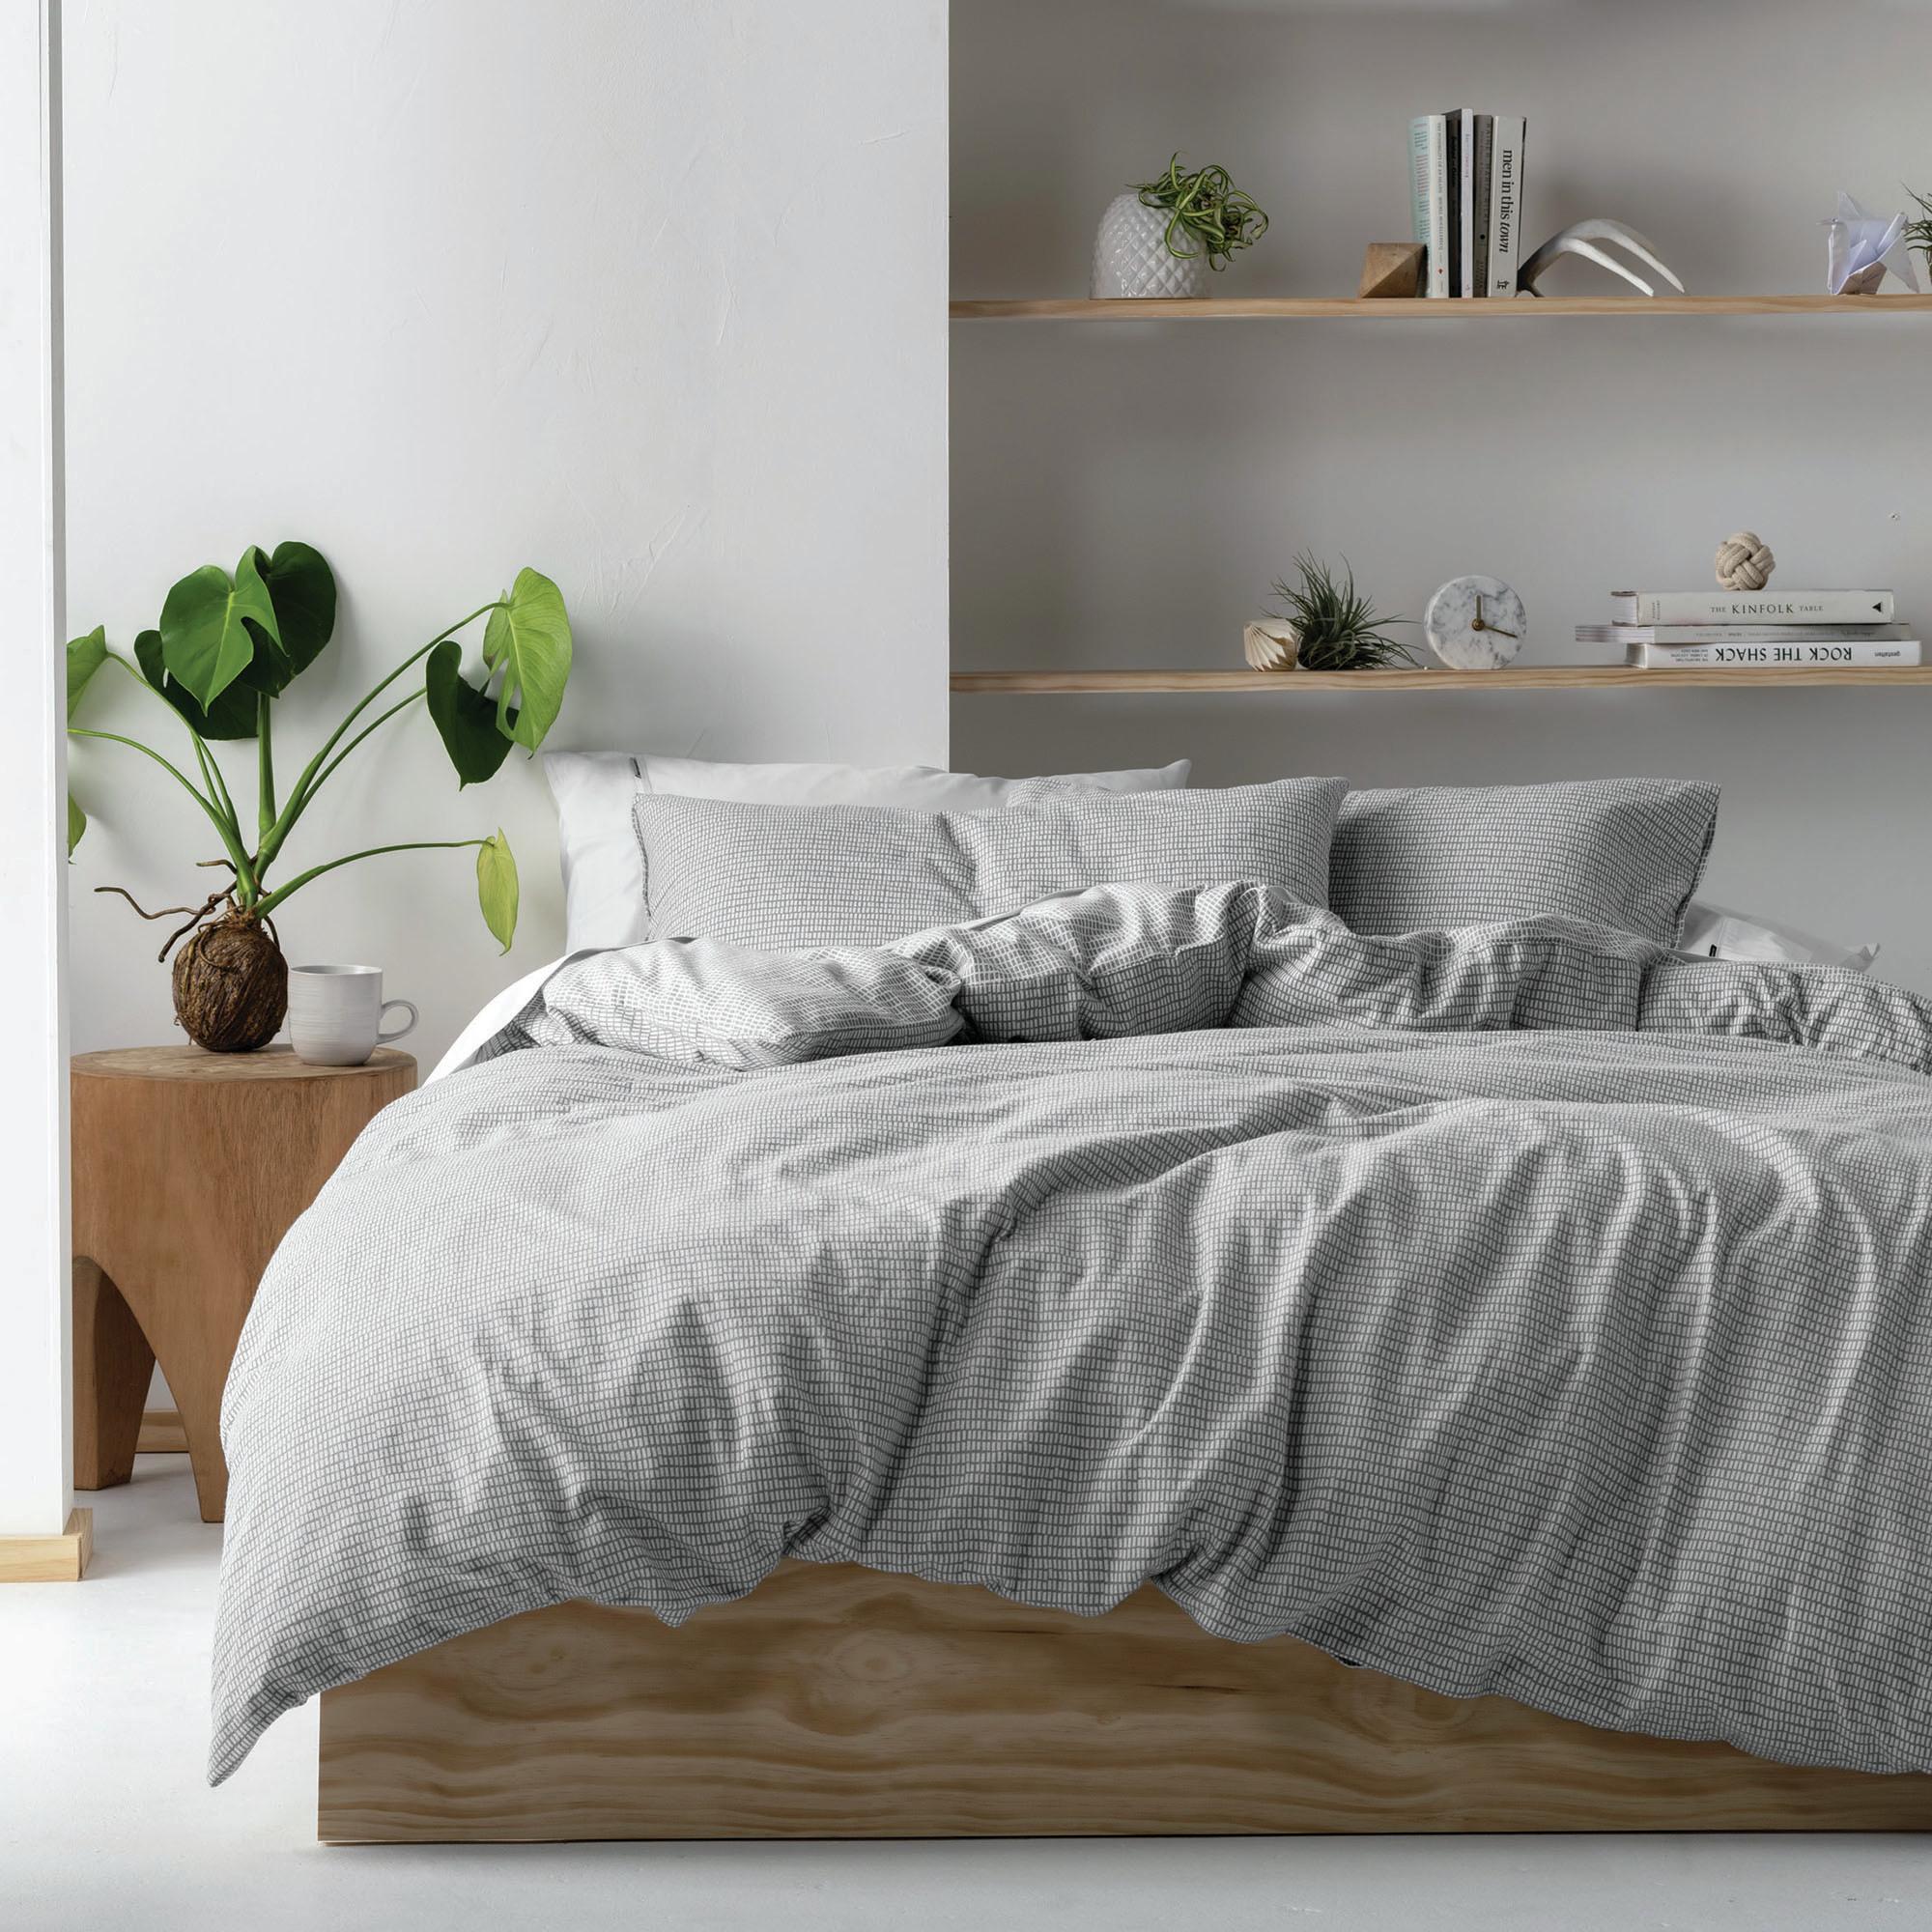 Home Furniture Diy Bedding Sets Duvet Covers Clearance Price Flannel 100 Brushed Cotton Sale Duvet Quilt Covers Bedding Sets Mtmstudioclub Com